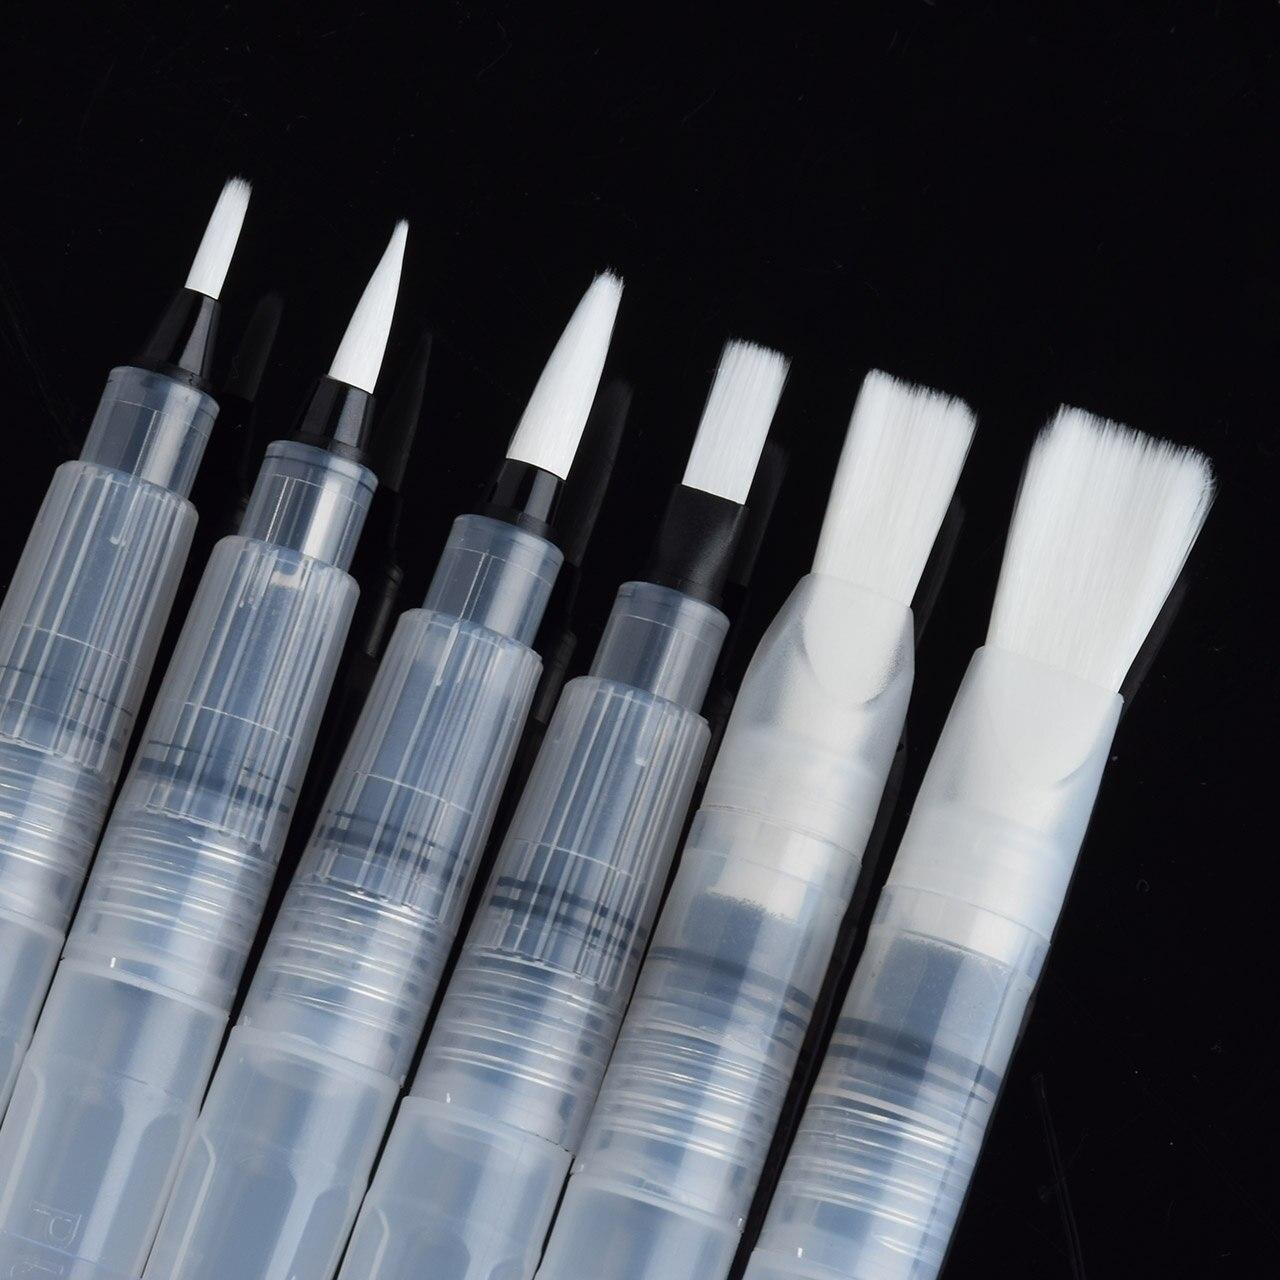 6Pcs/Set Different Shape Large Capacity Barrel Water Paint Brush Set For Self Moistening Pen Calligraphy Drawing Art Supplies